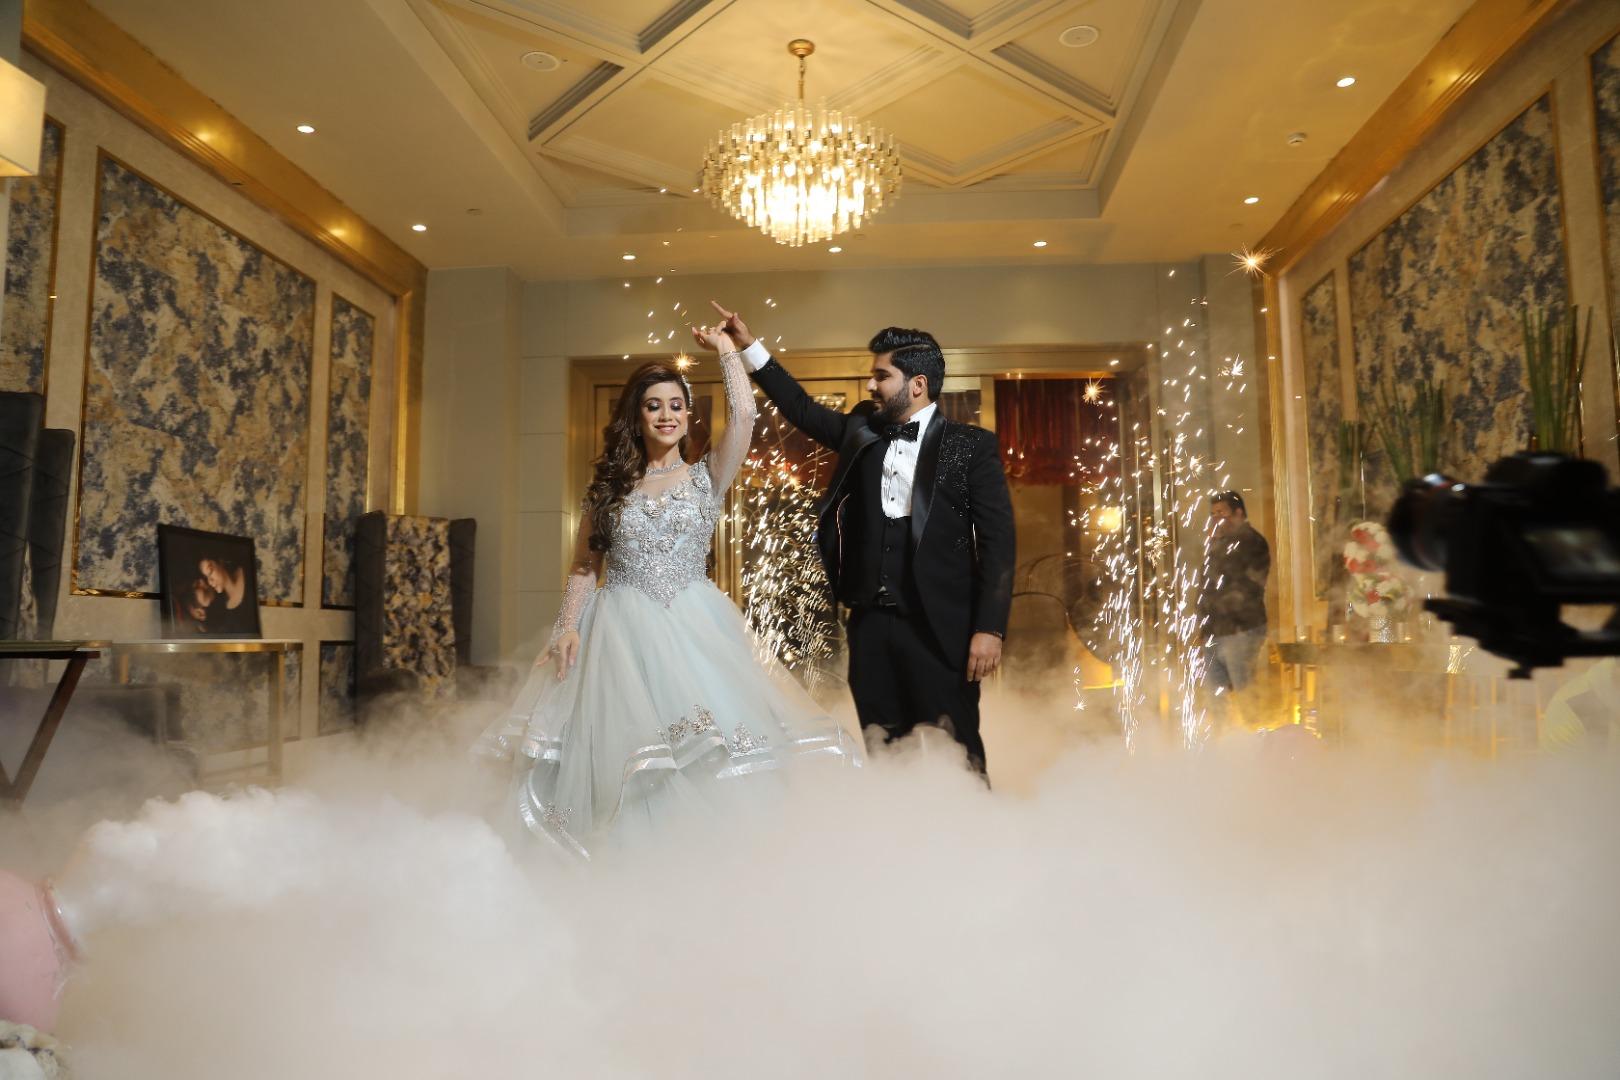 bride twirls with her groom